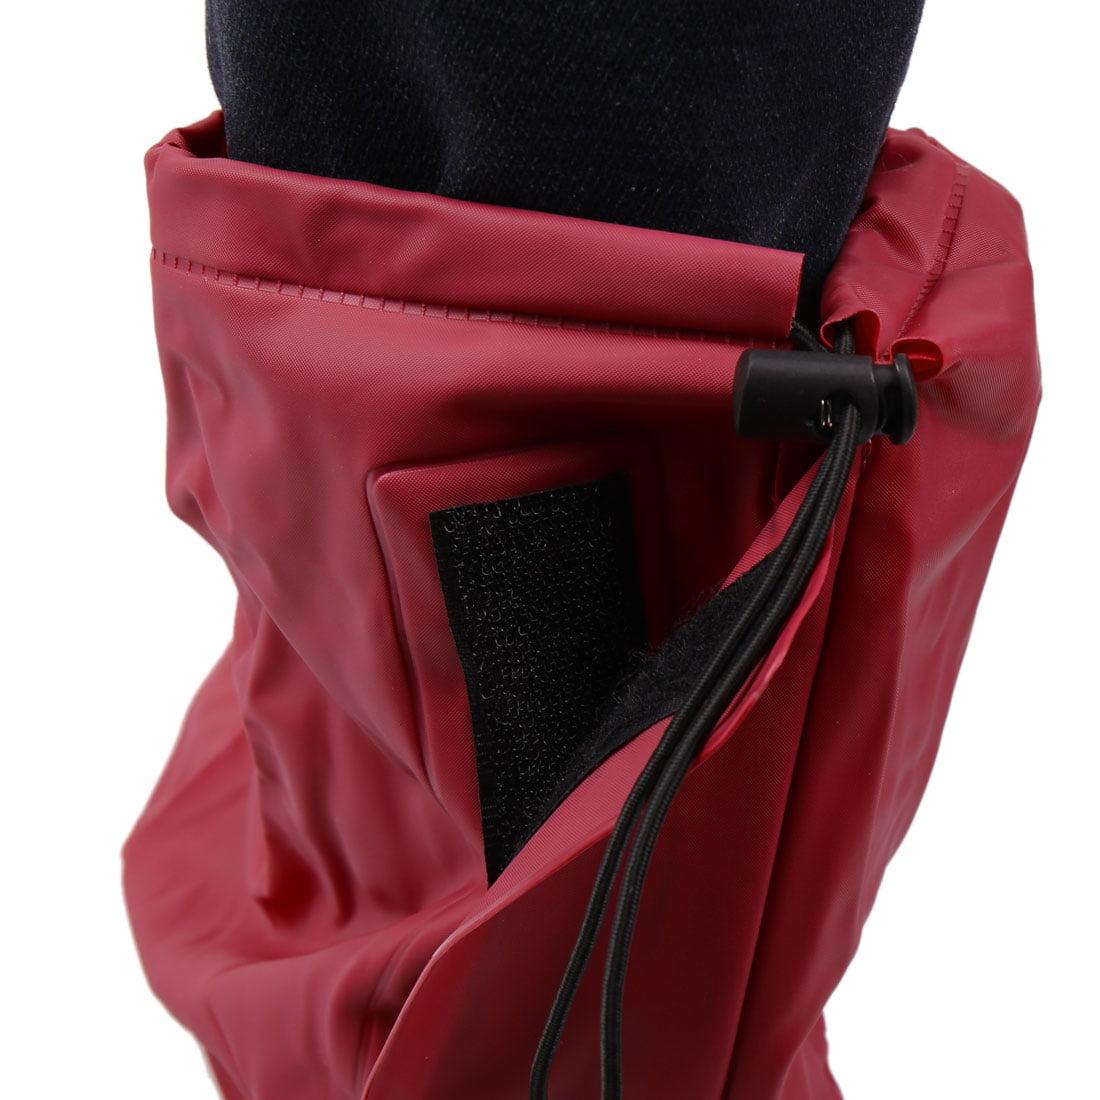 1Pair Wine Red Motorcycle Nonslip Waterproof Adjustable Rain Shoes Boot Cover XL - image 2 de 5